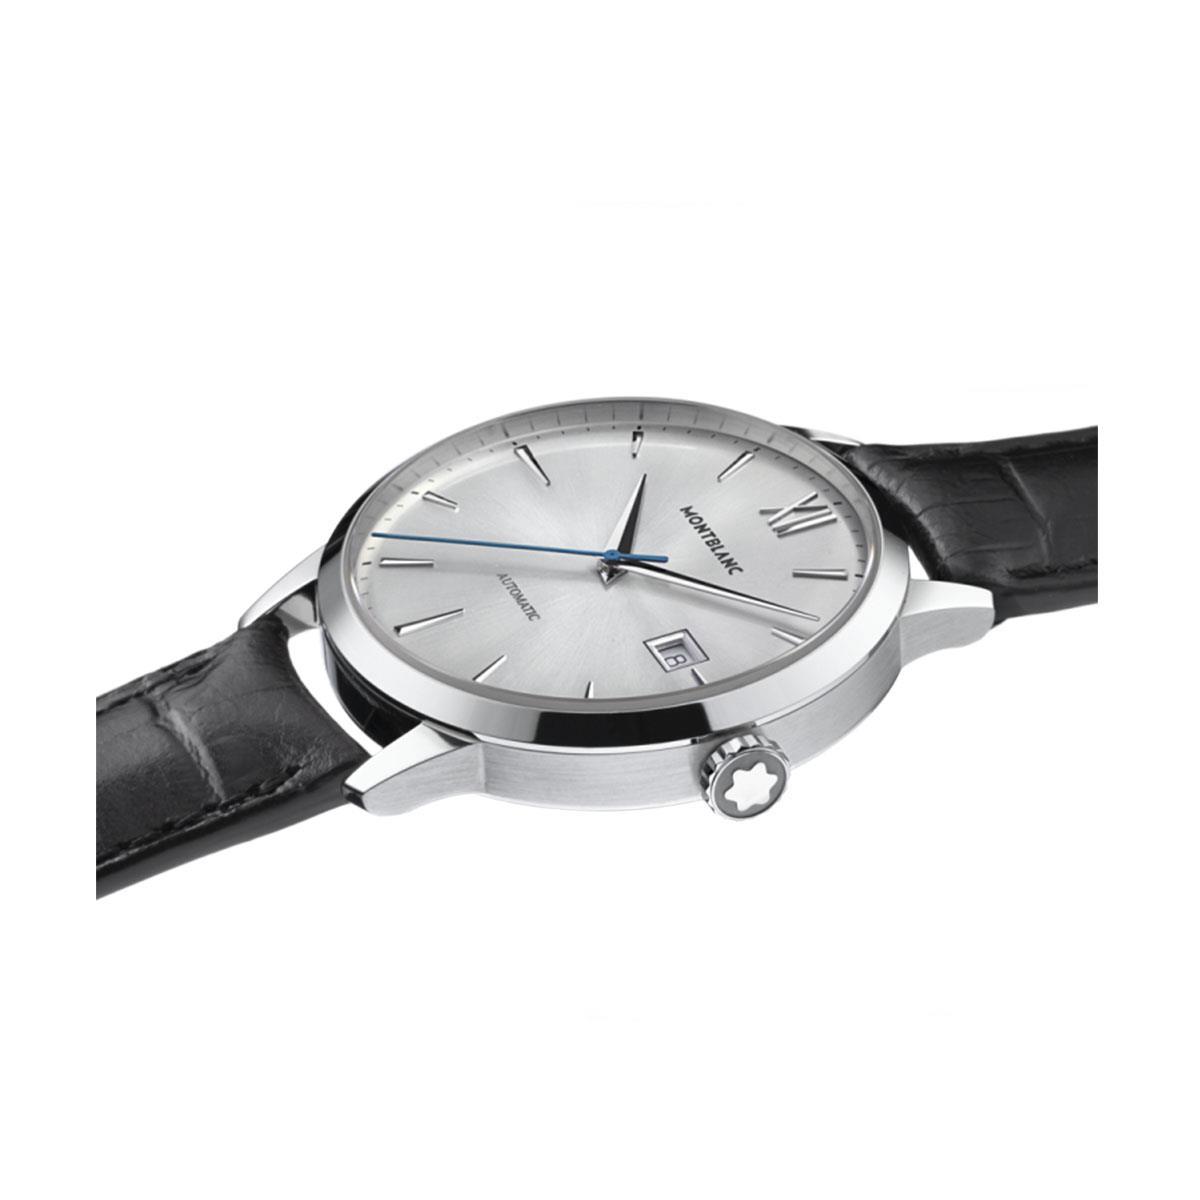 360ef520b7c Relógio Montblanc Heritage Spirit Date Automatic com Pulseira de Couro Preto